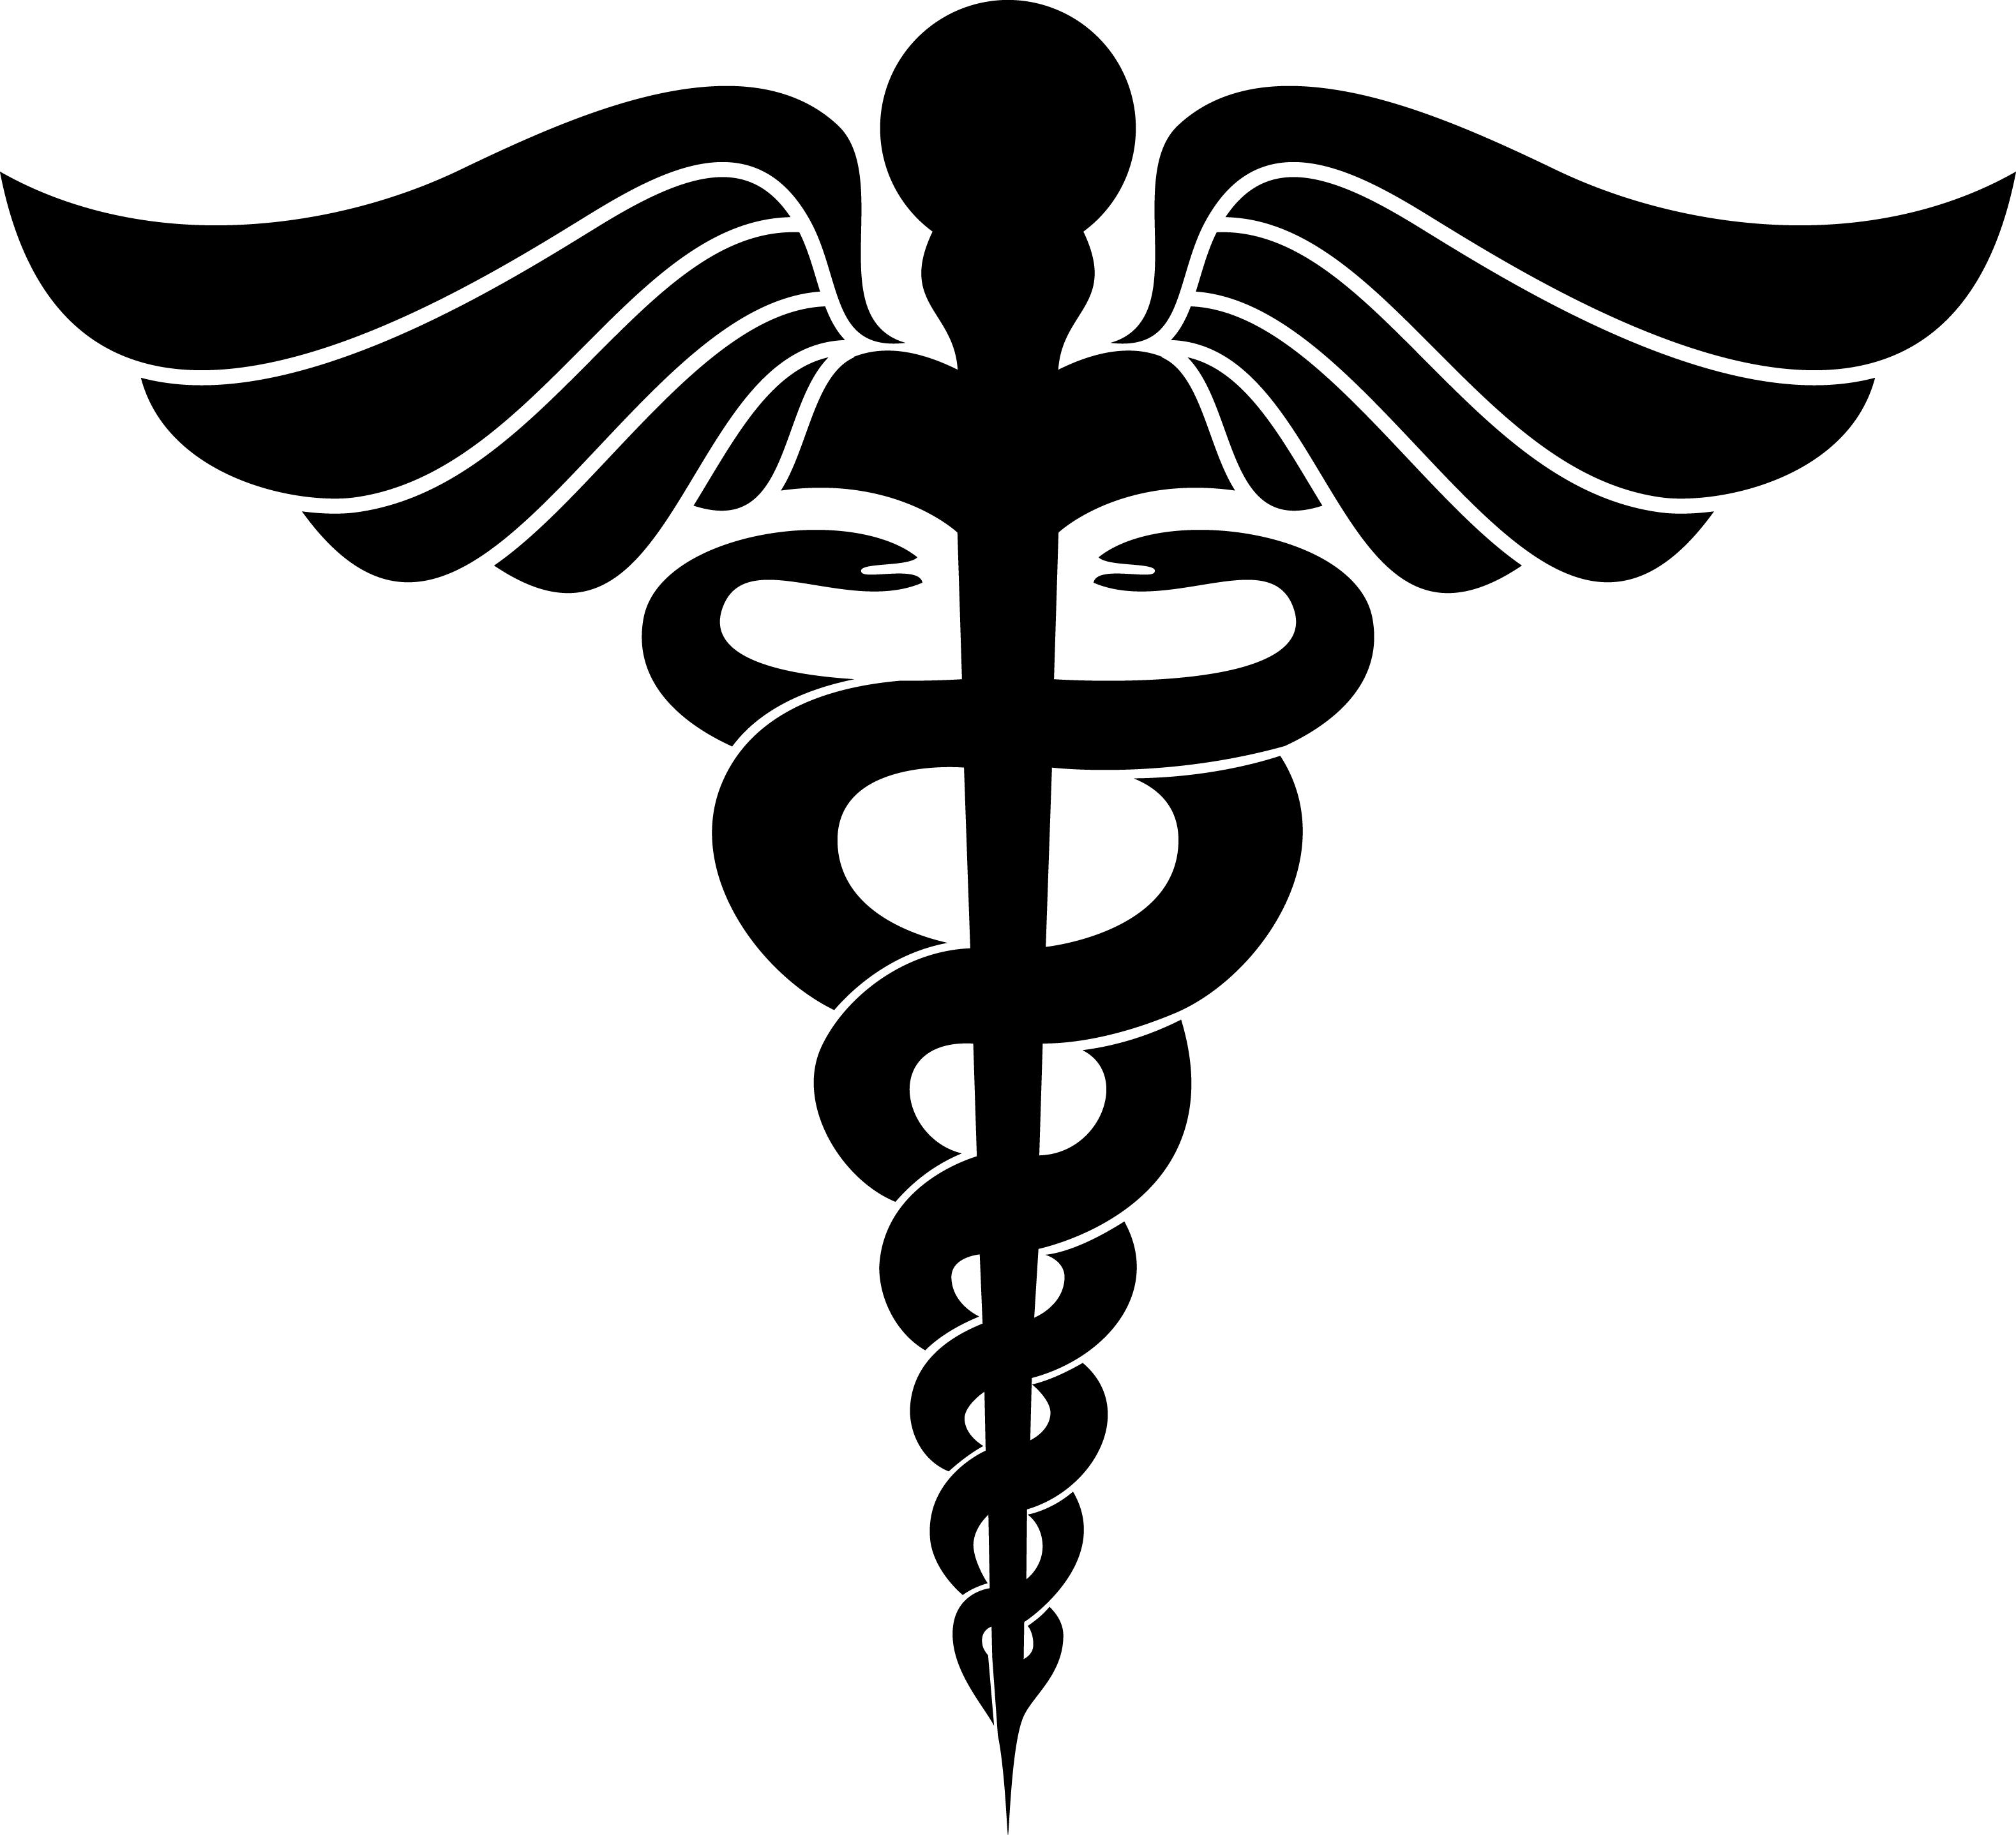 Symbol clipart medical Kid BBCpersian7 art clip Rn